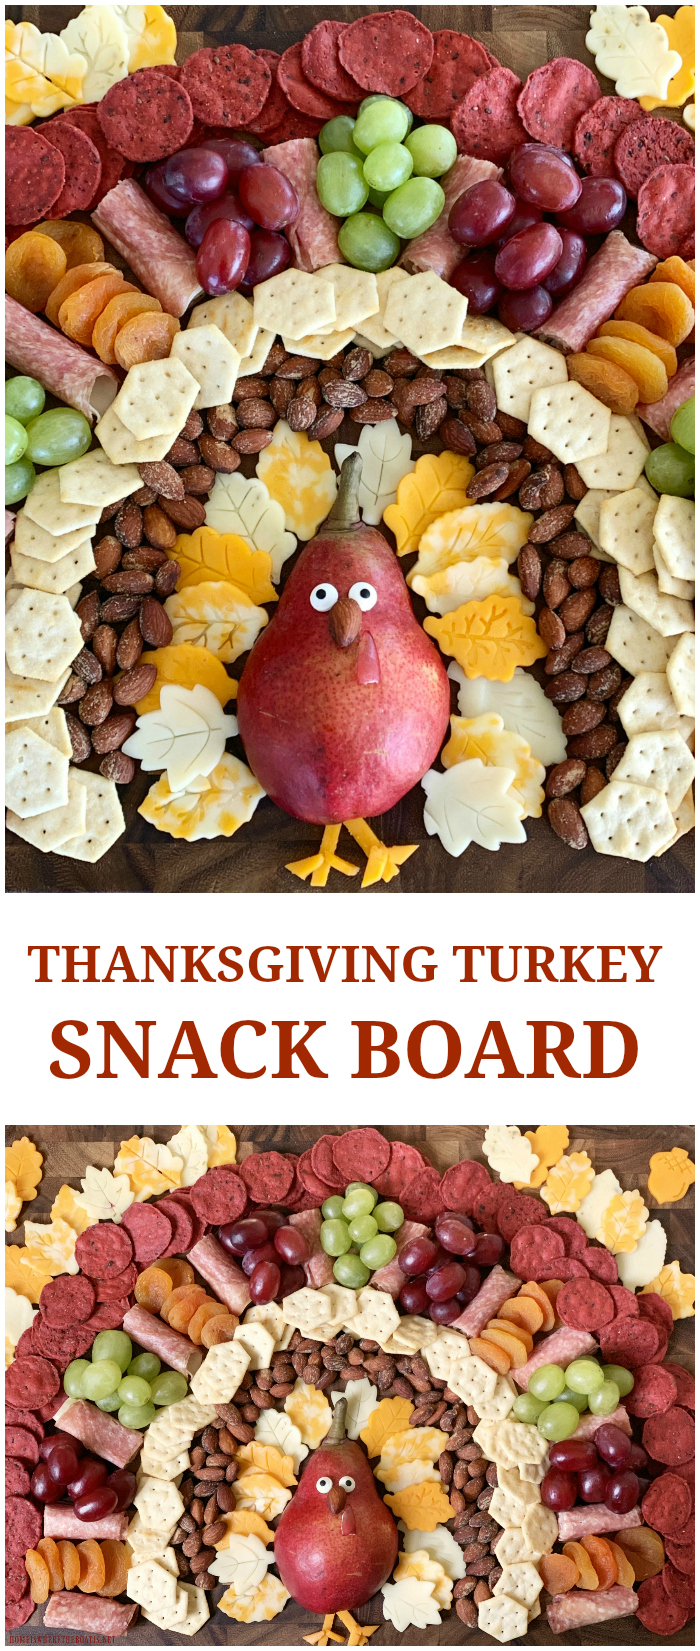 Turkey Snack Board for Thanksgiving | ©homeiswheretheboatis.net #thanksgiving